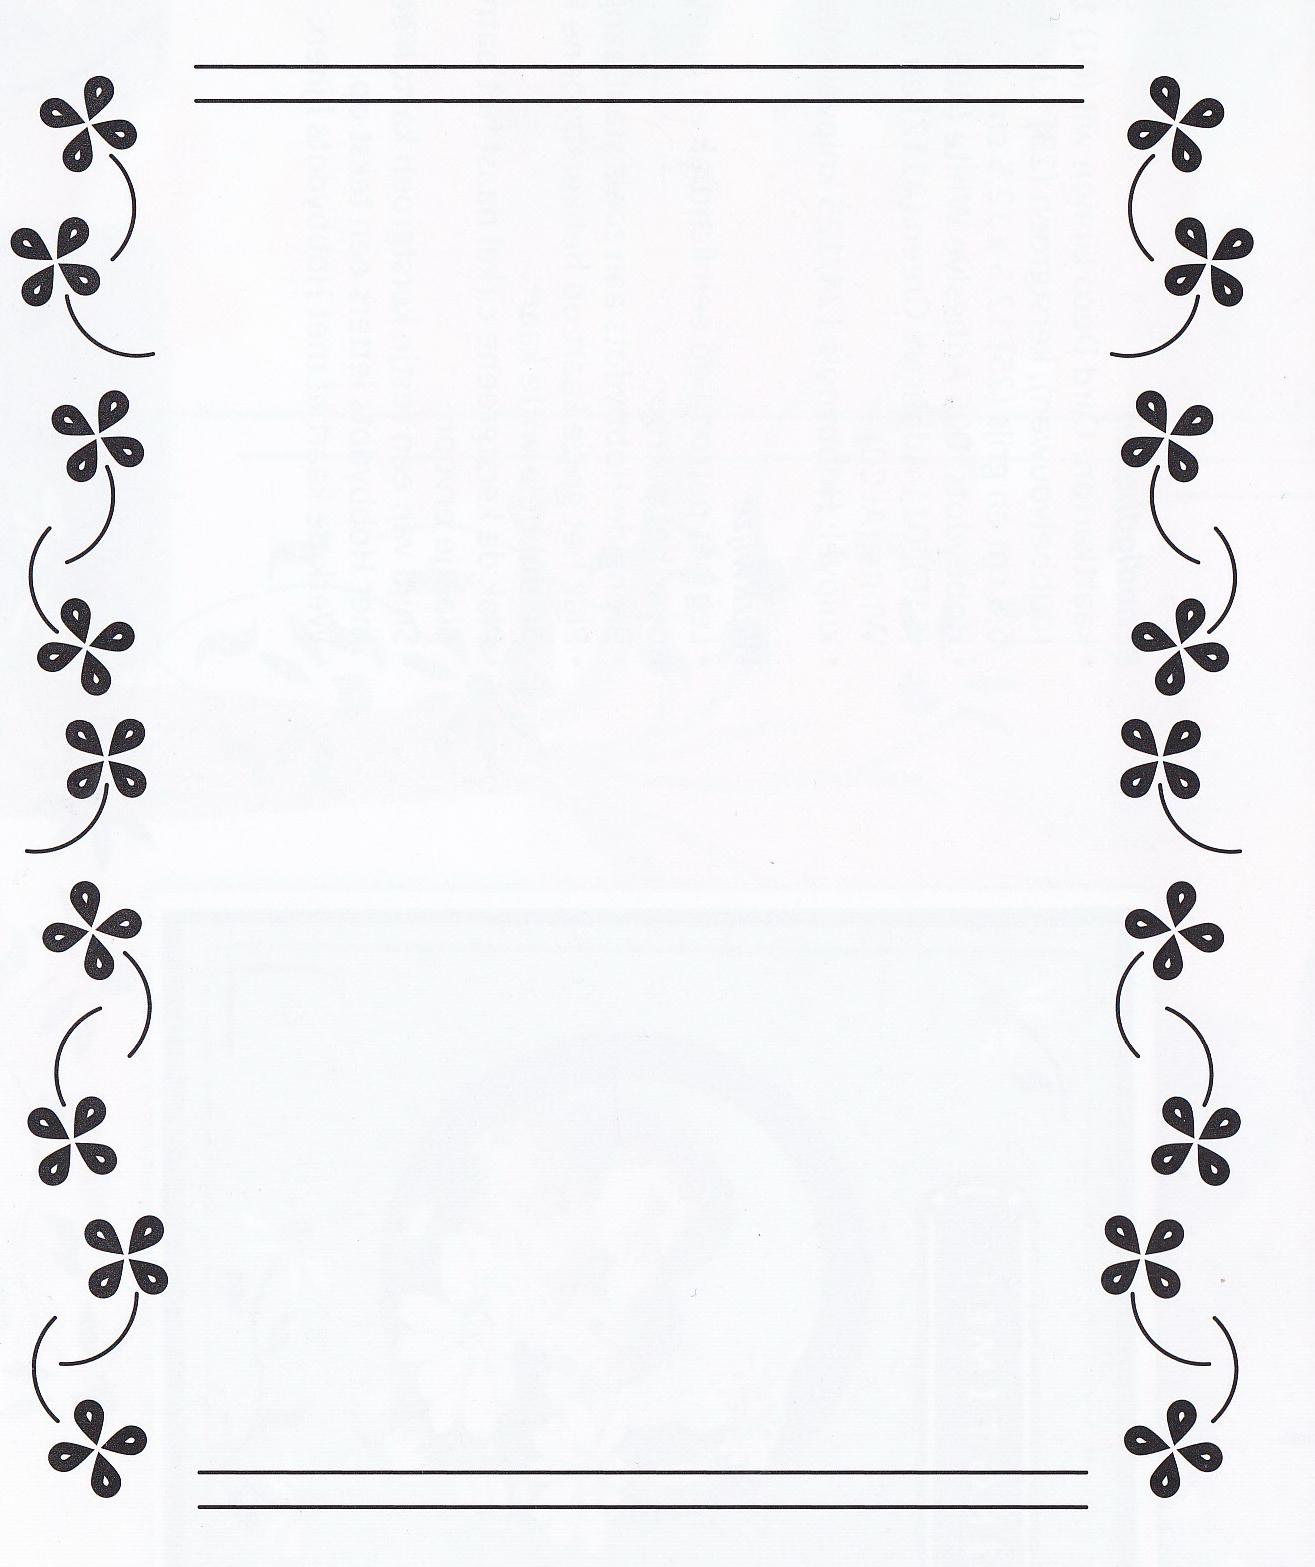 Frame Border Page Borders Design Borders For Paper Clip Art Borders